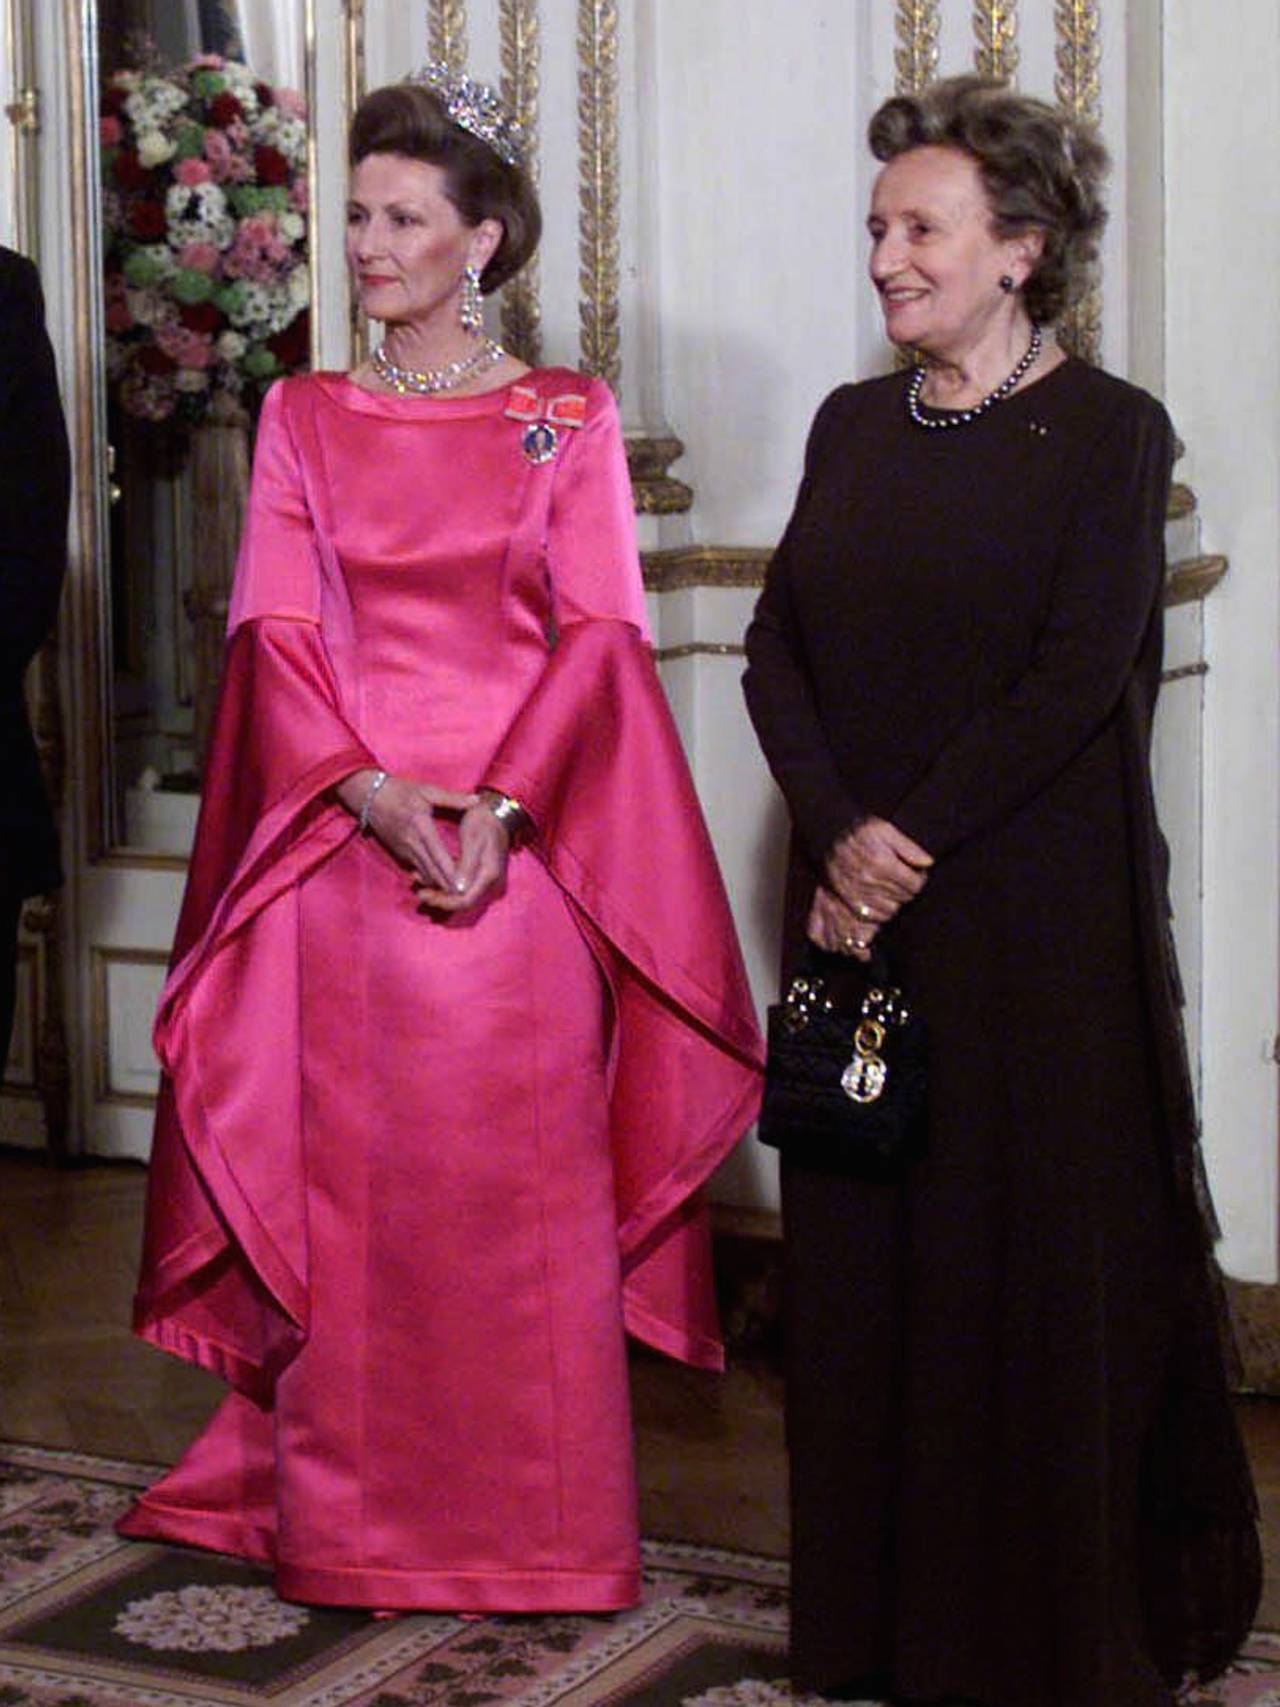 Dronning Sonja i ståkjolen